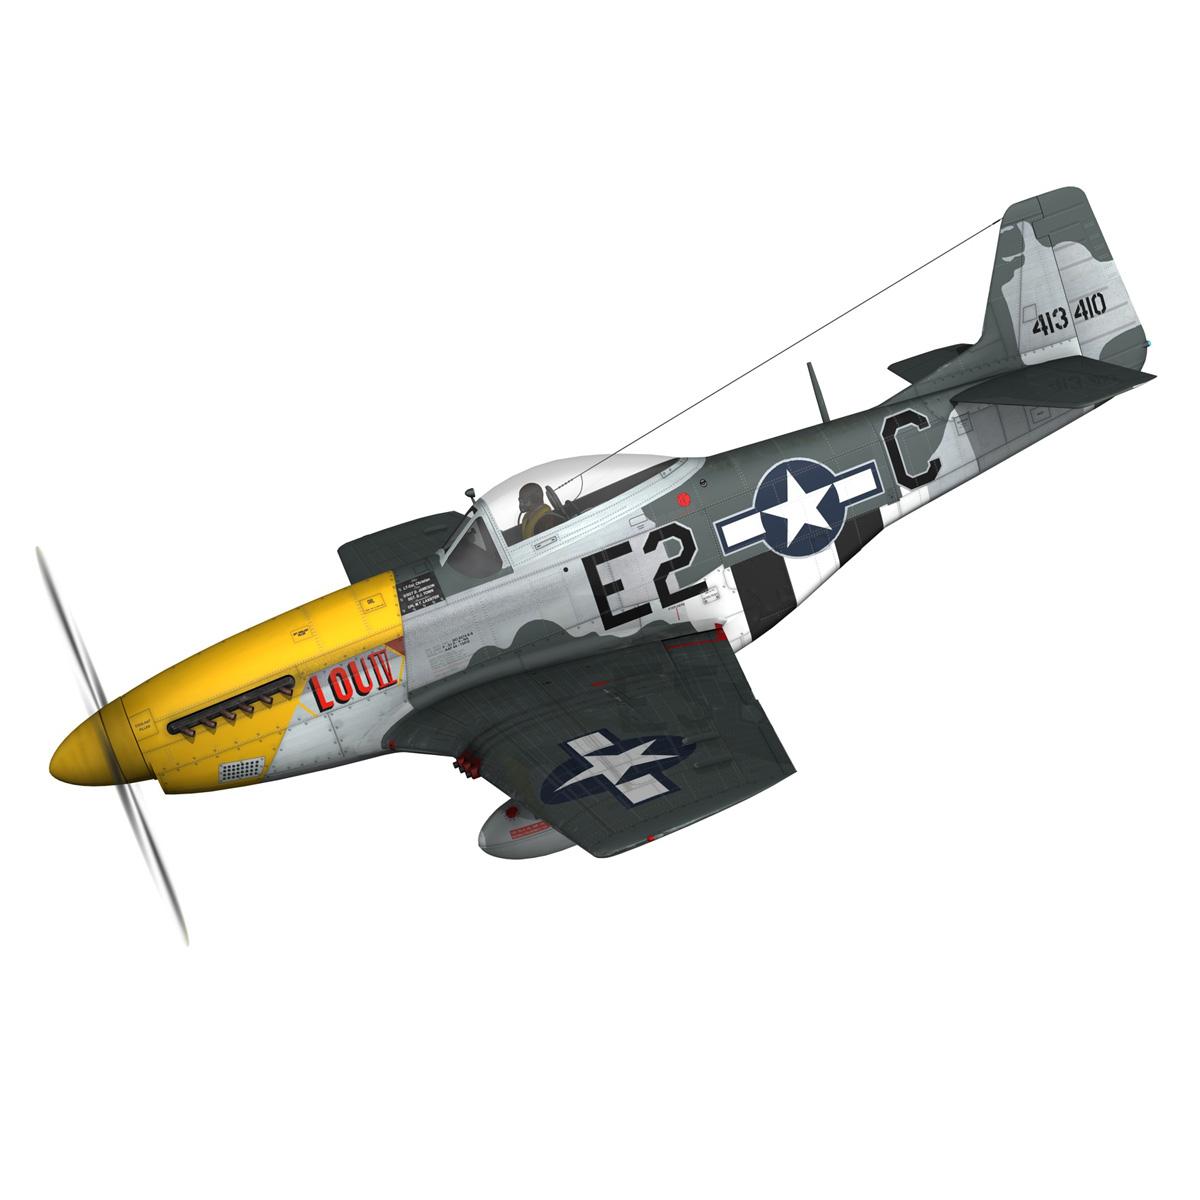 north american p-51d mustang – lou iv 3d model fbx c4d lwo obj 272599